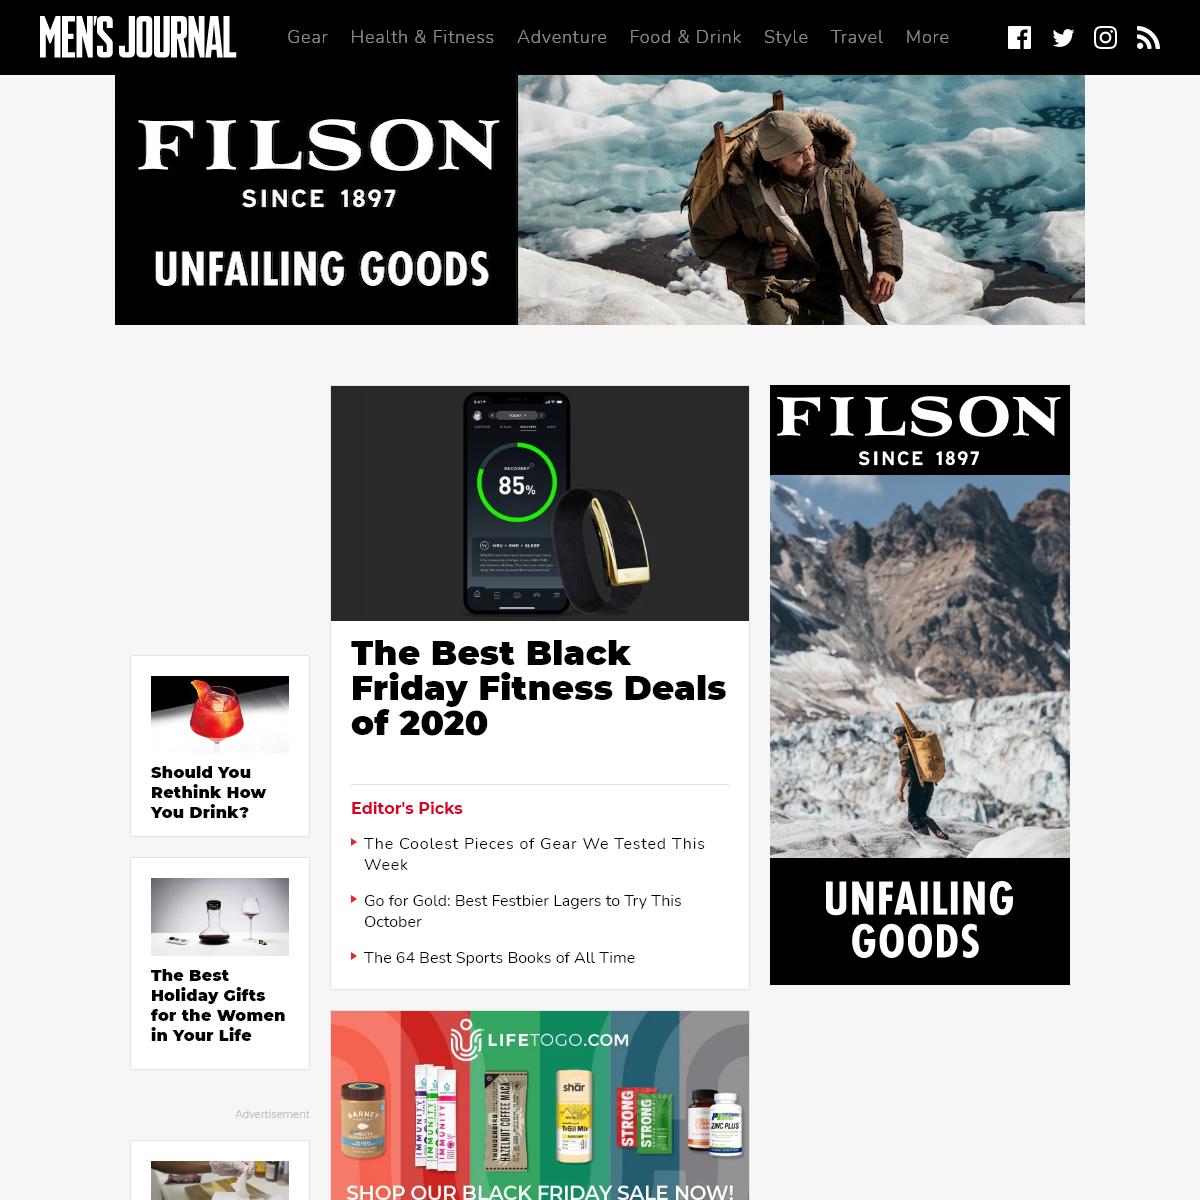 Men`s Journal- Health, Adventure, Gear, Style